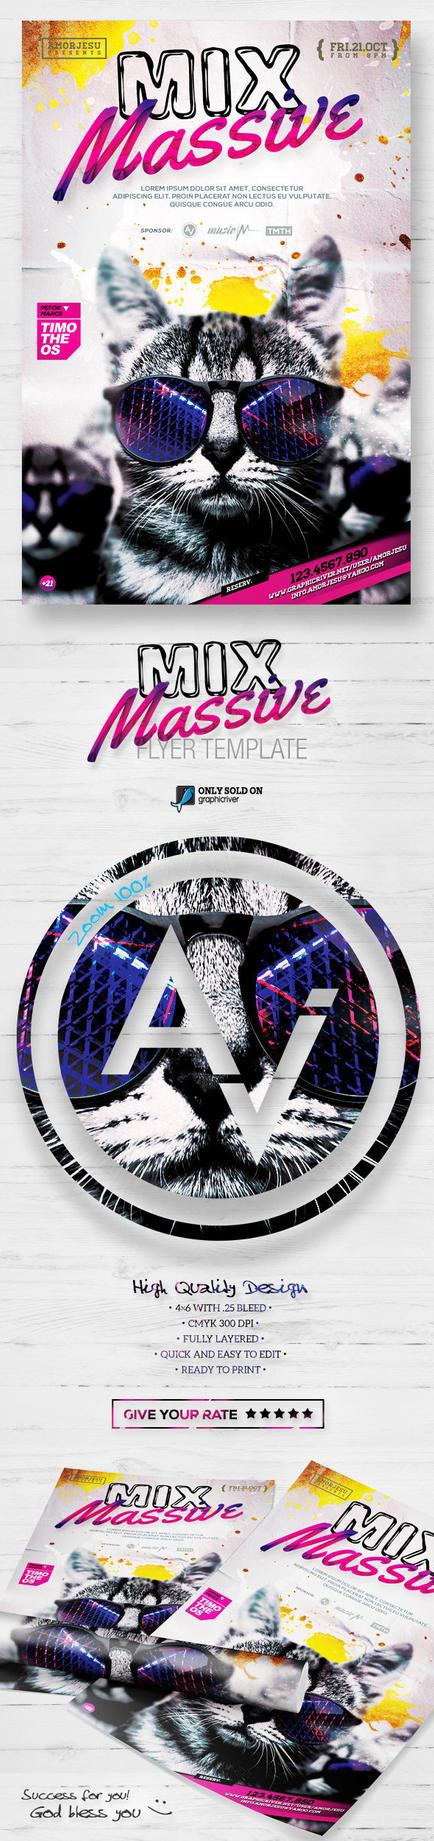 Mix Massive Flyer Template by amorjesu